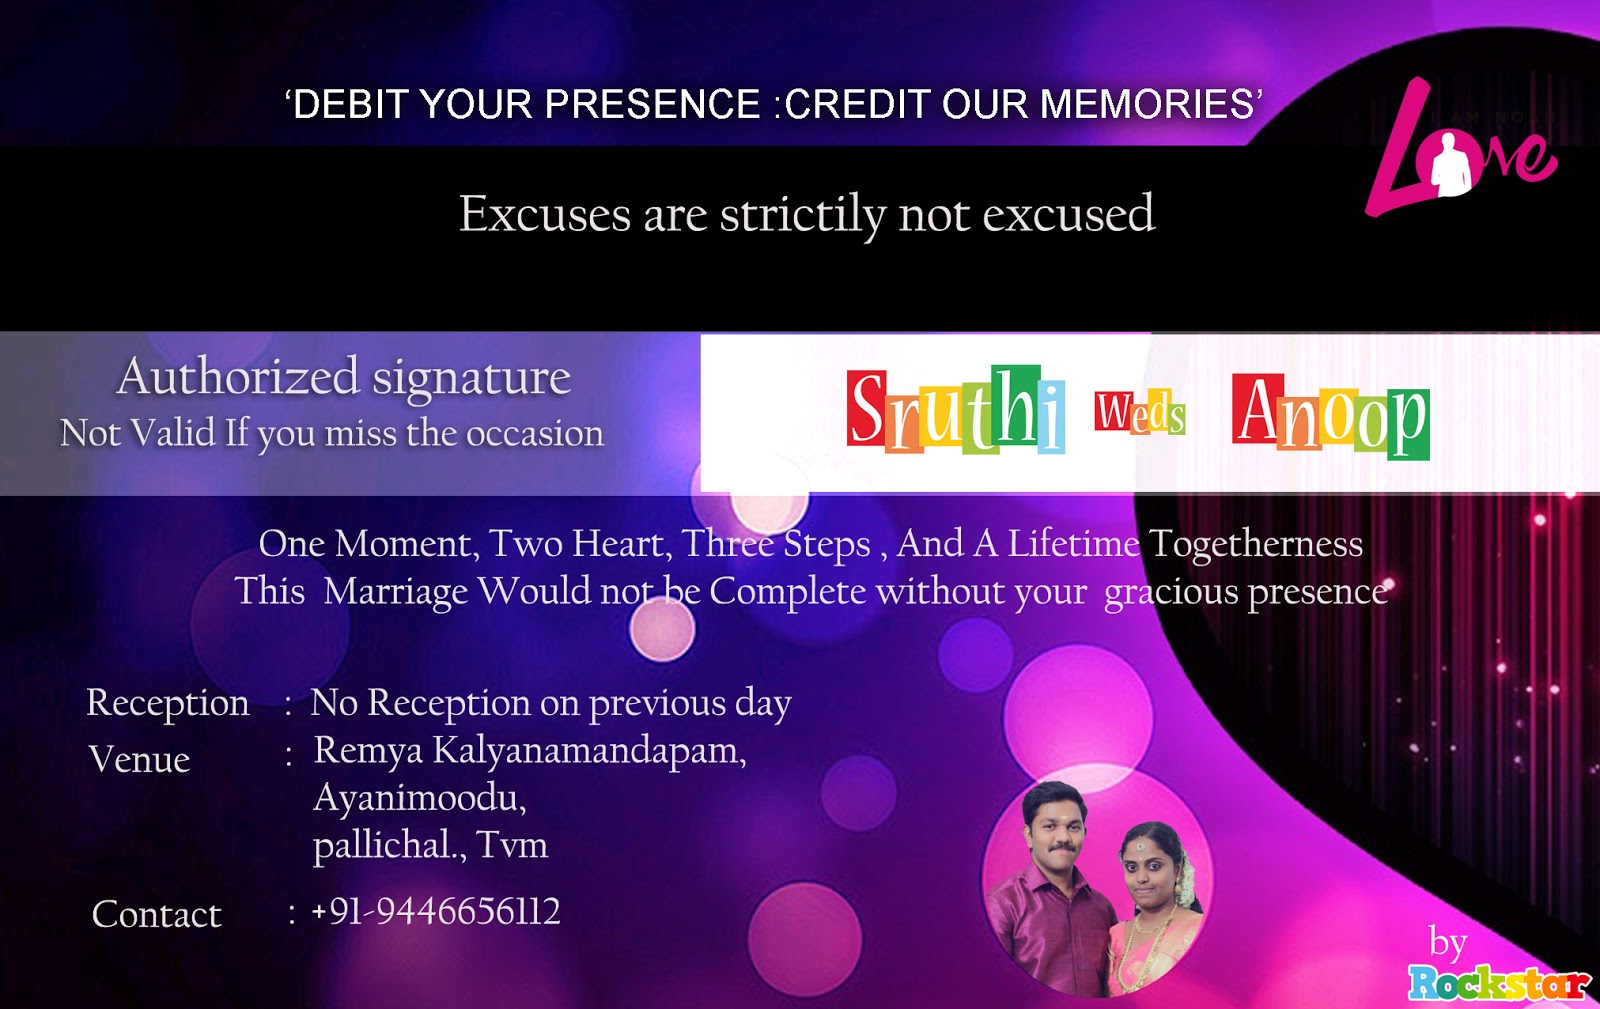 Sreejith rockstar jithu sruthi weds anoop atm style wedding sruthi weds anoop atm style wedding card wedding invitation card design by sreejith rockstar stopboris Choice Image